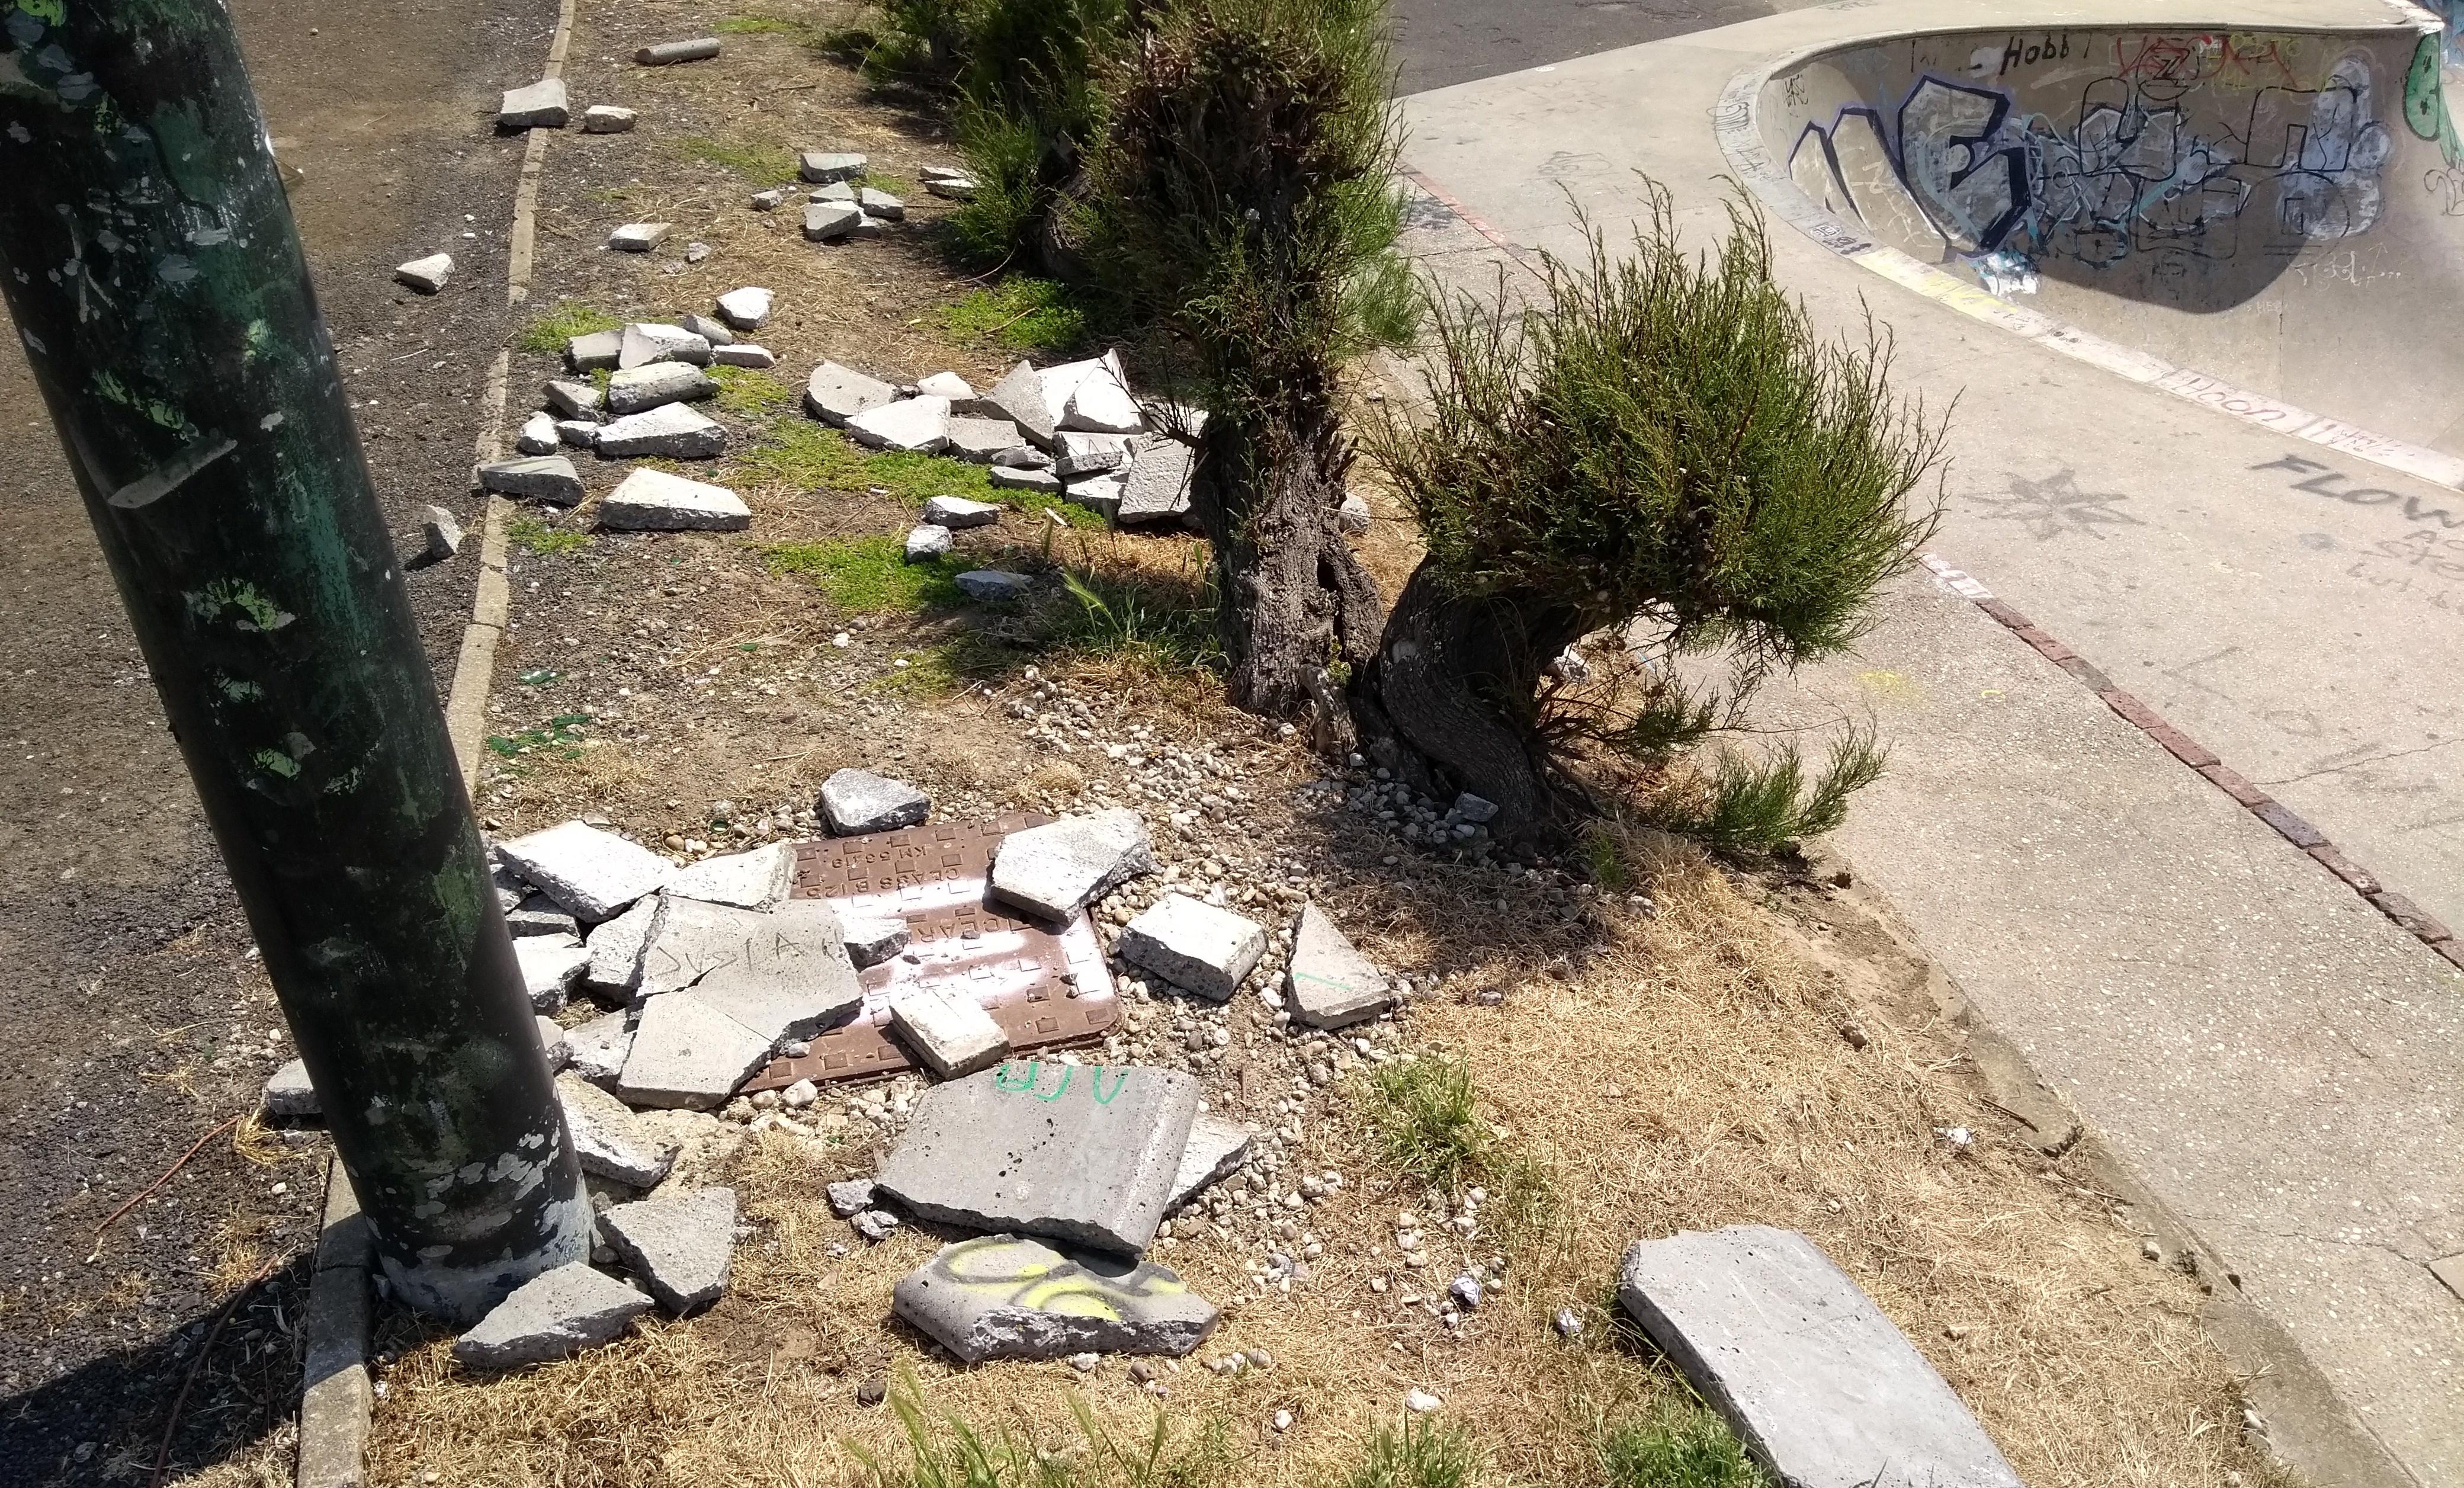 Criminal damage at skate park threatens its closure